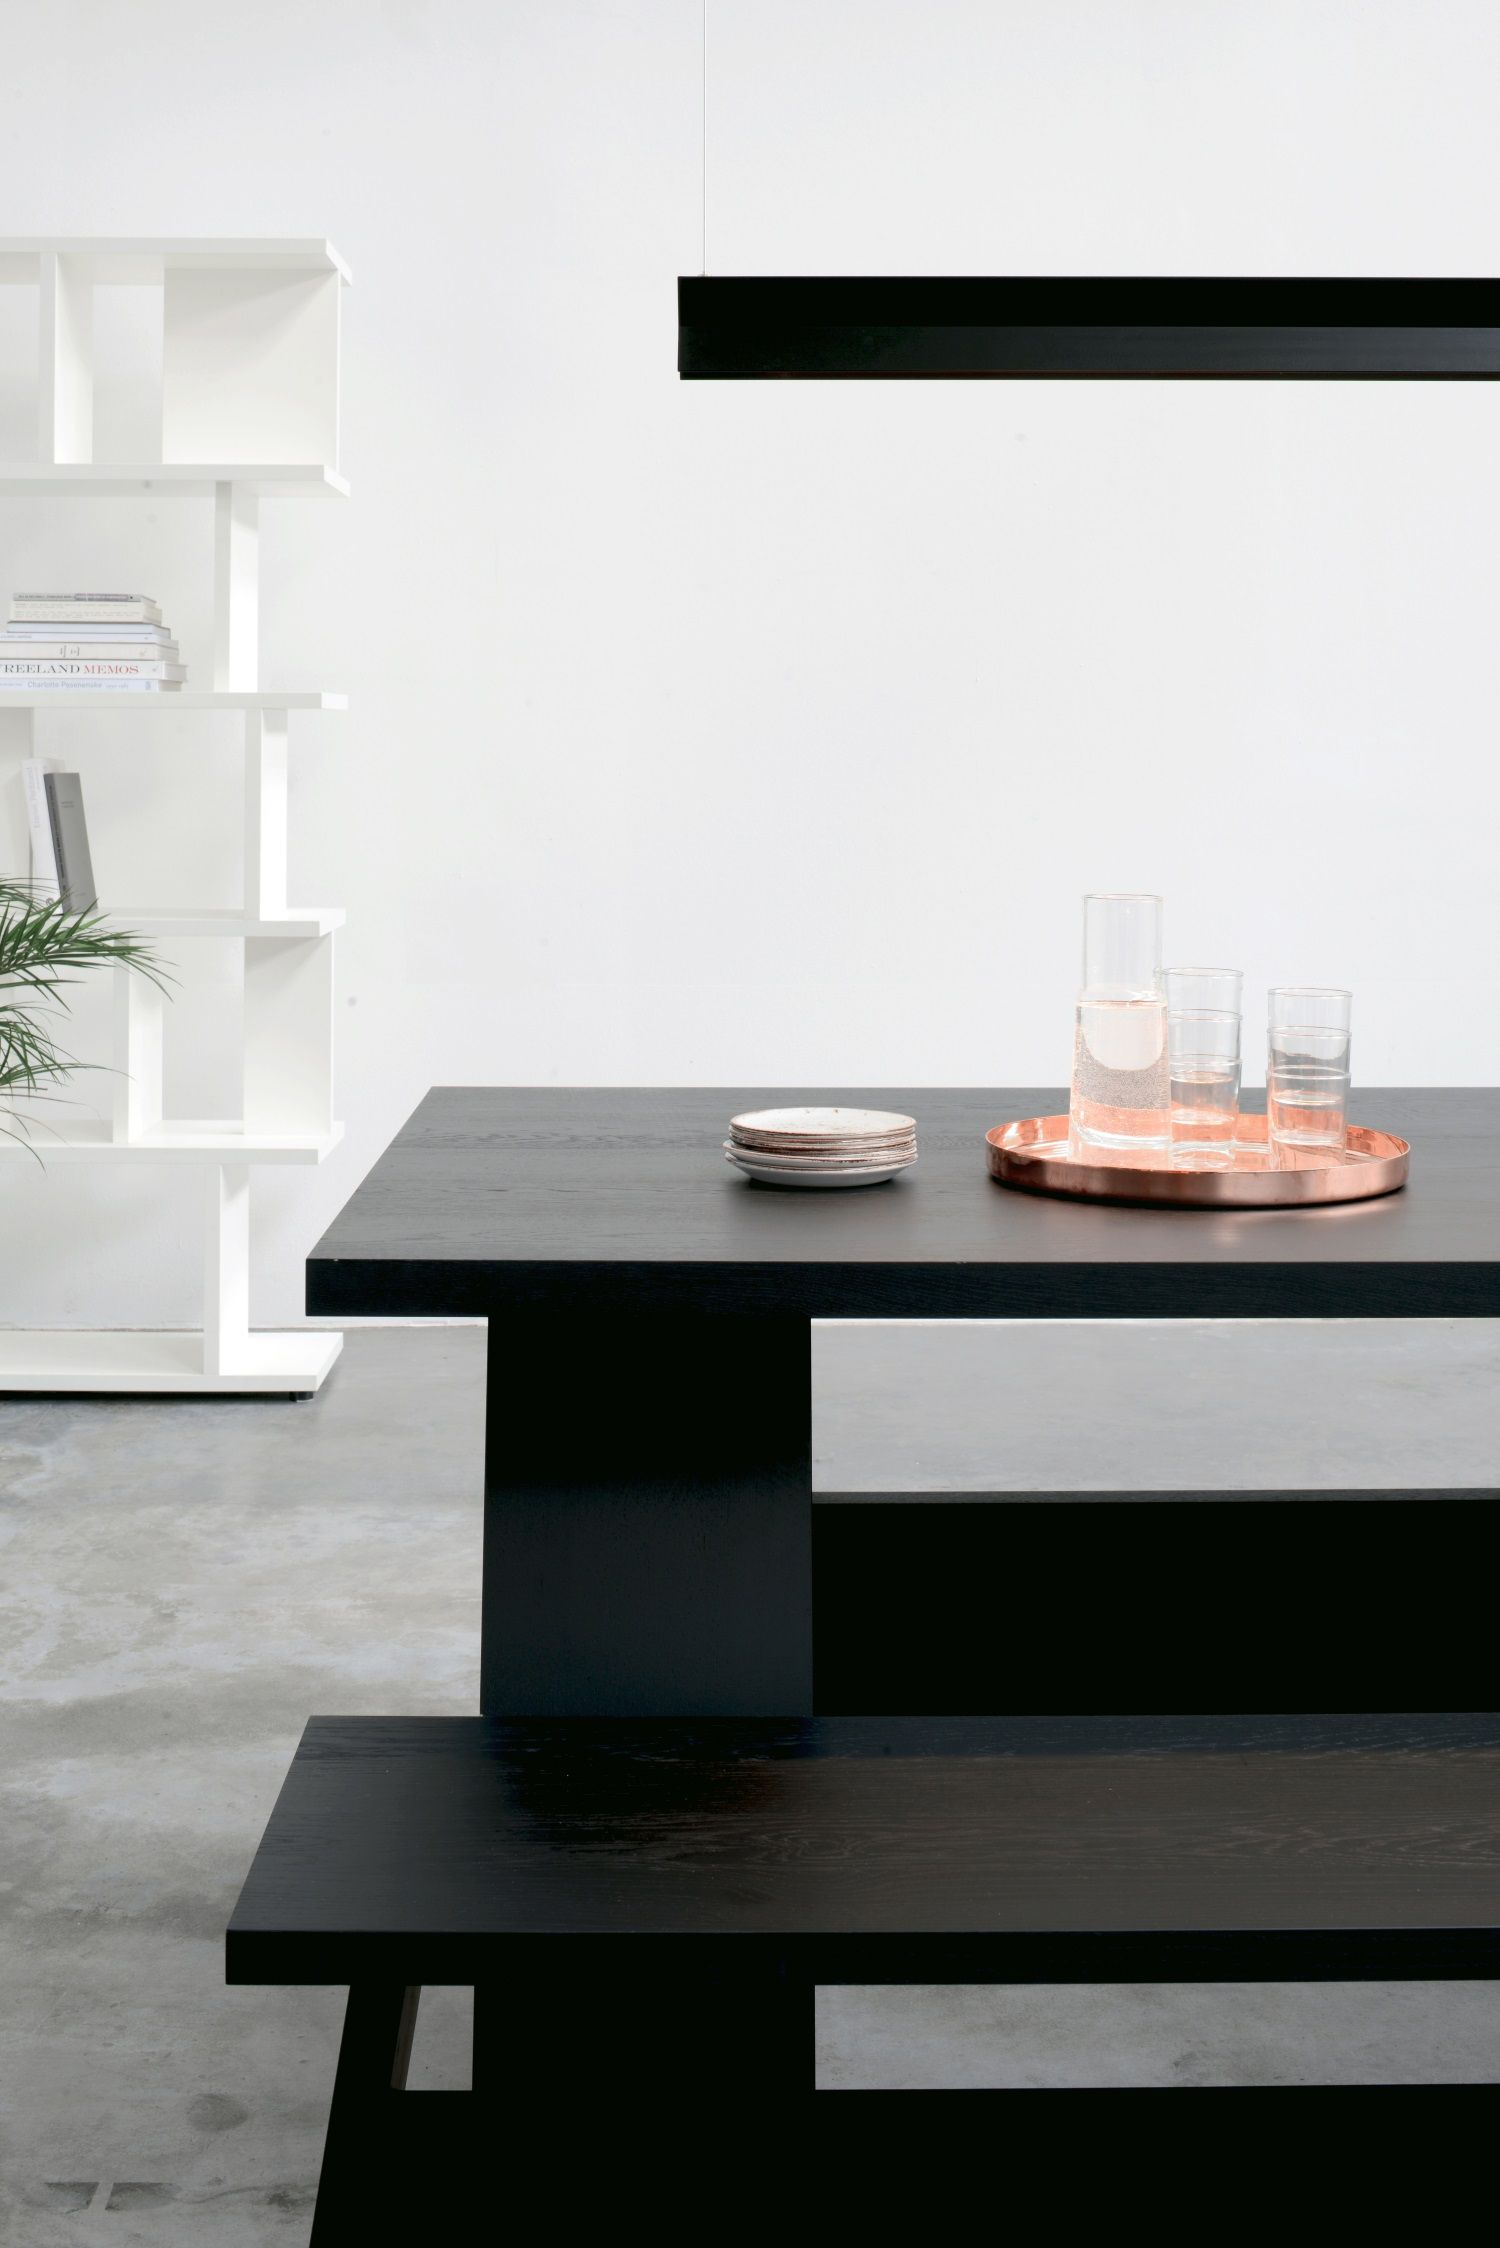 52262ad4df063af4653f986601feadca Incroyable De Table Basse Le Corbusier Concept